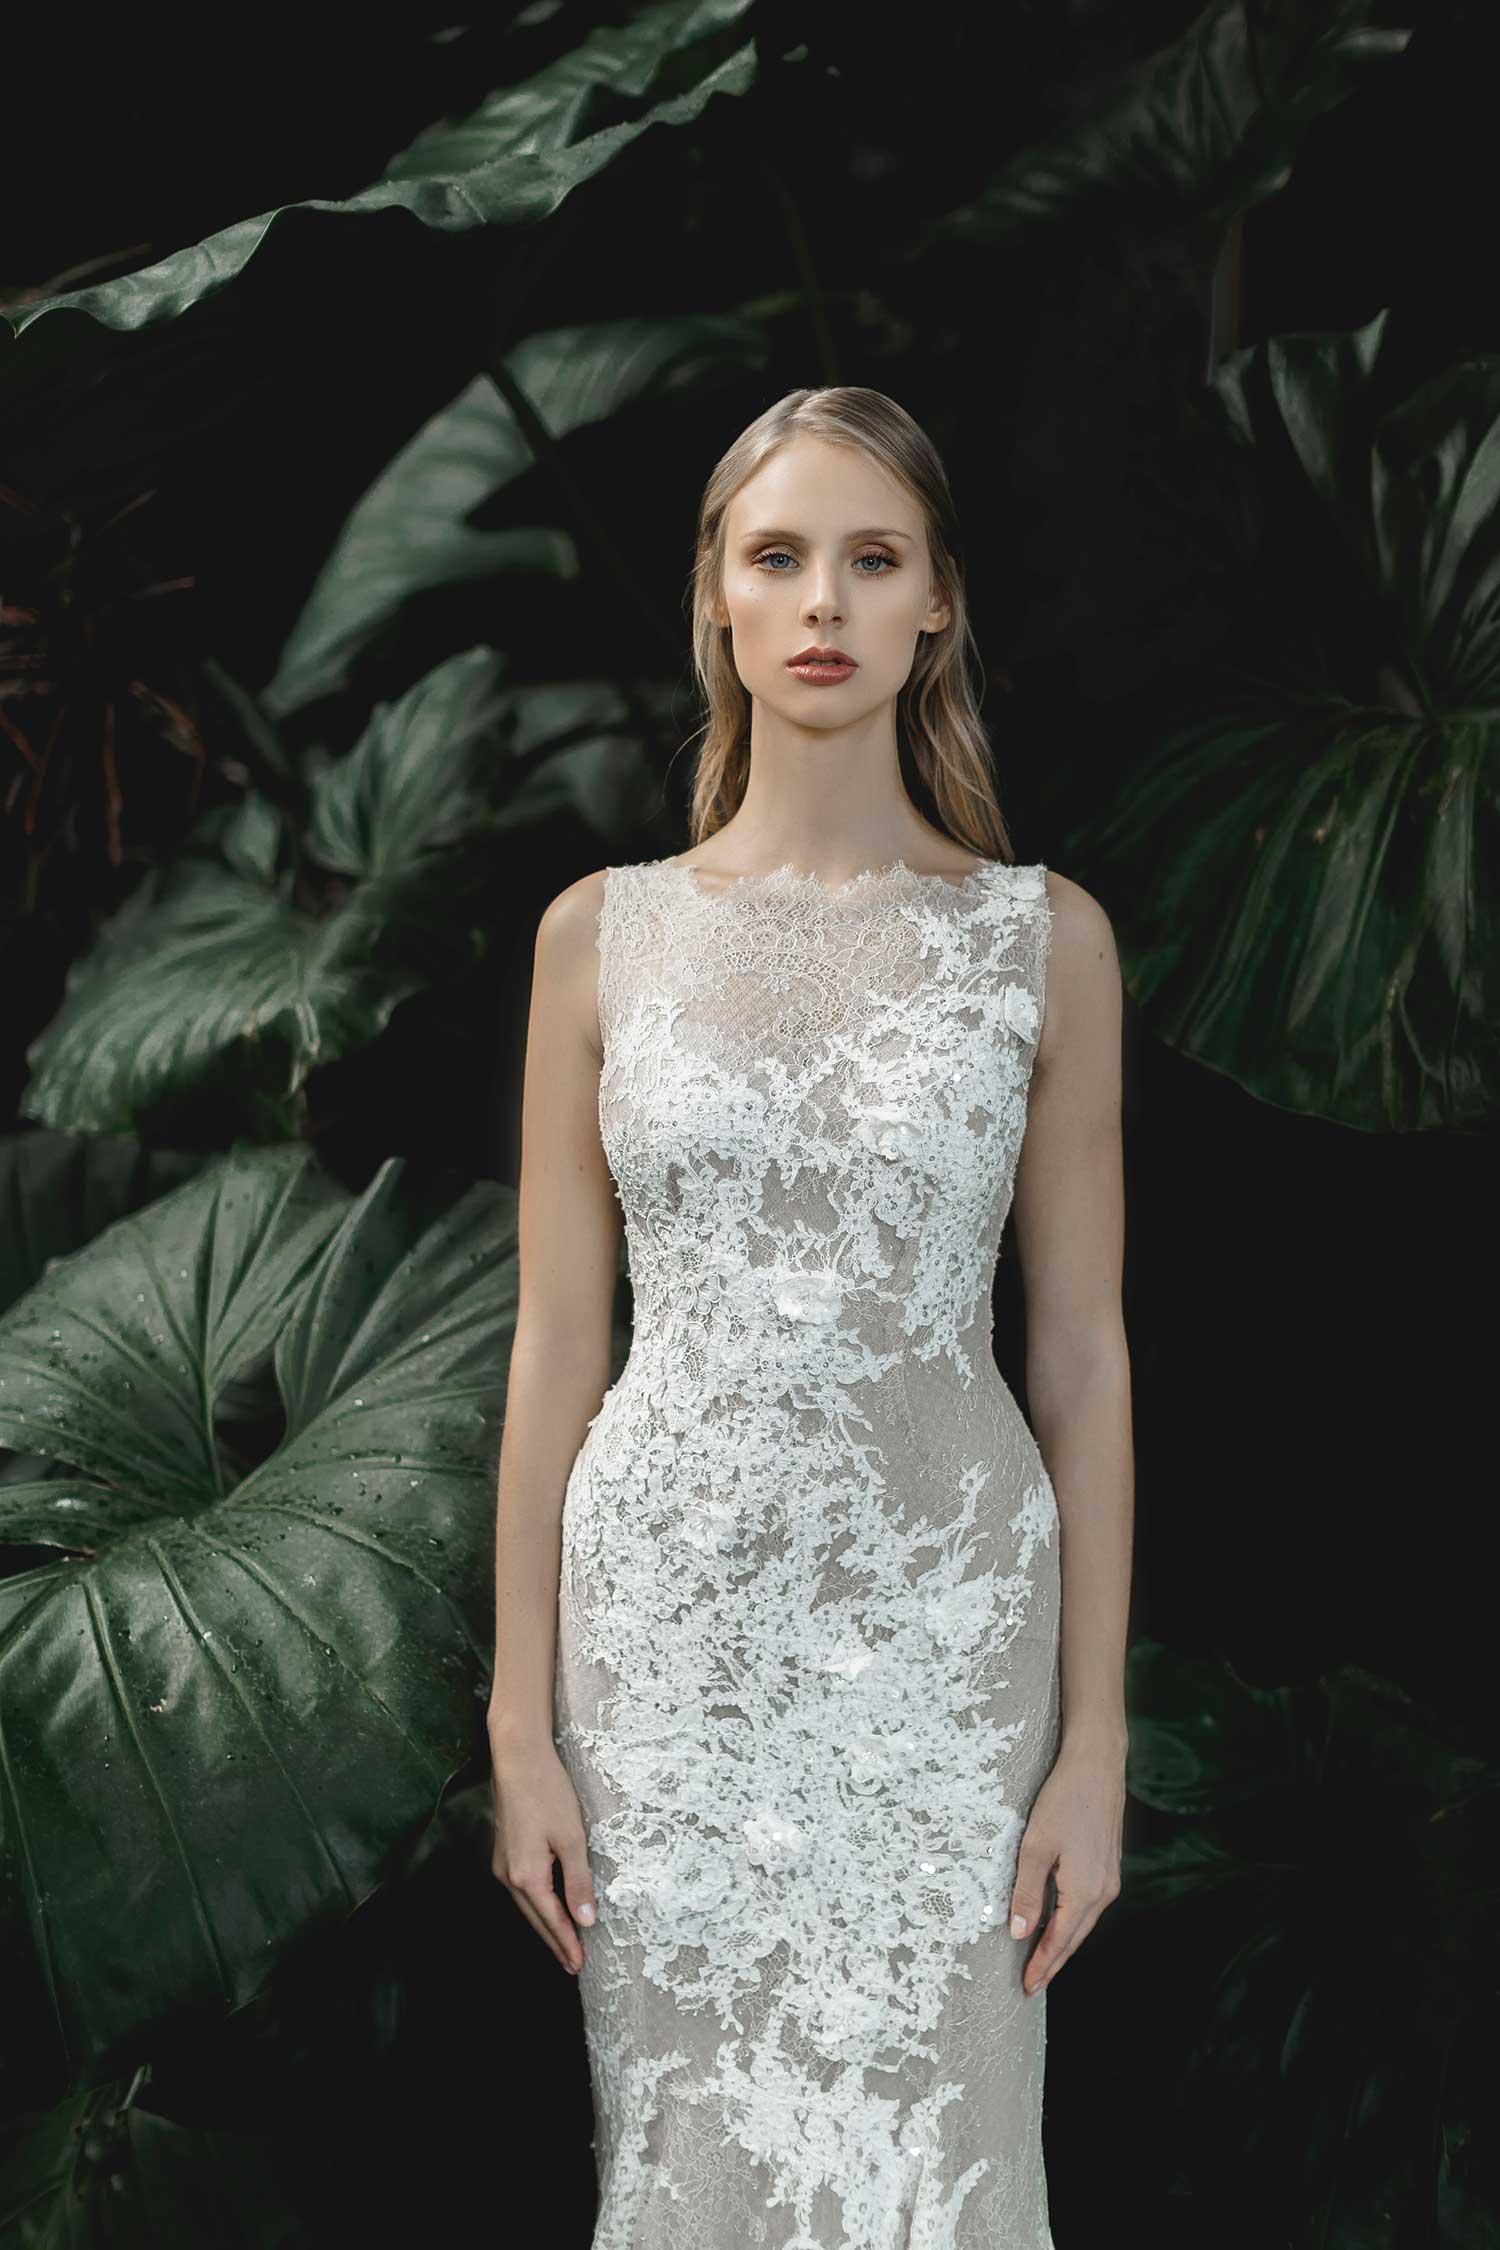 Elegant bridal editorial photoshoot